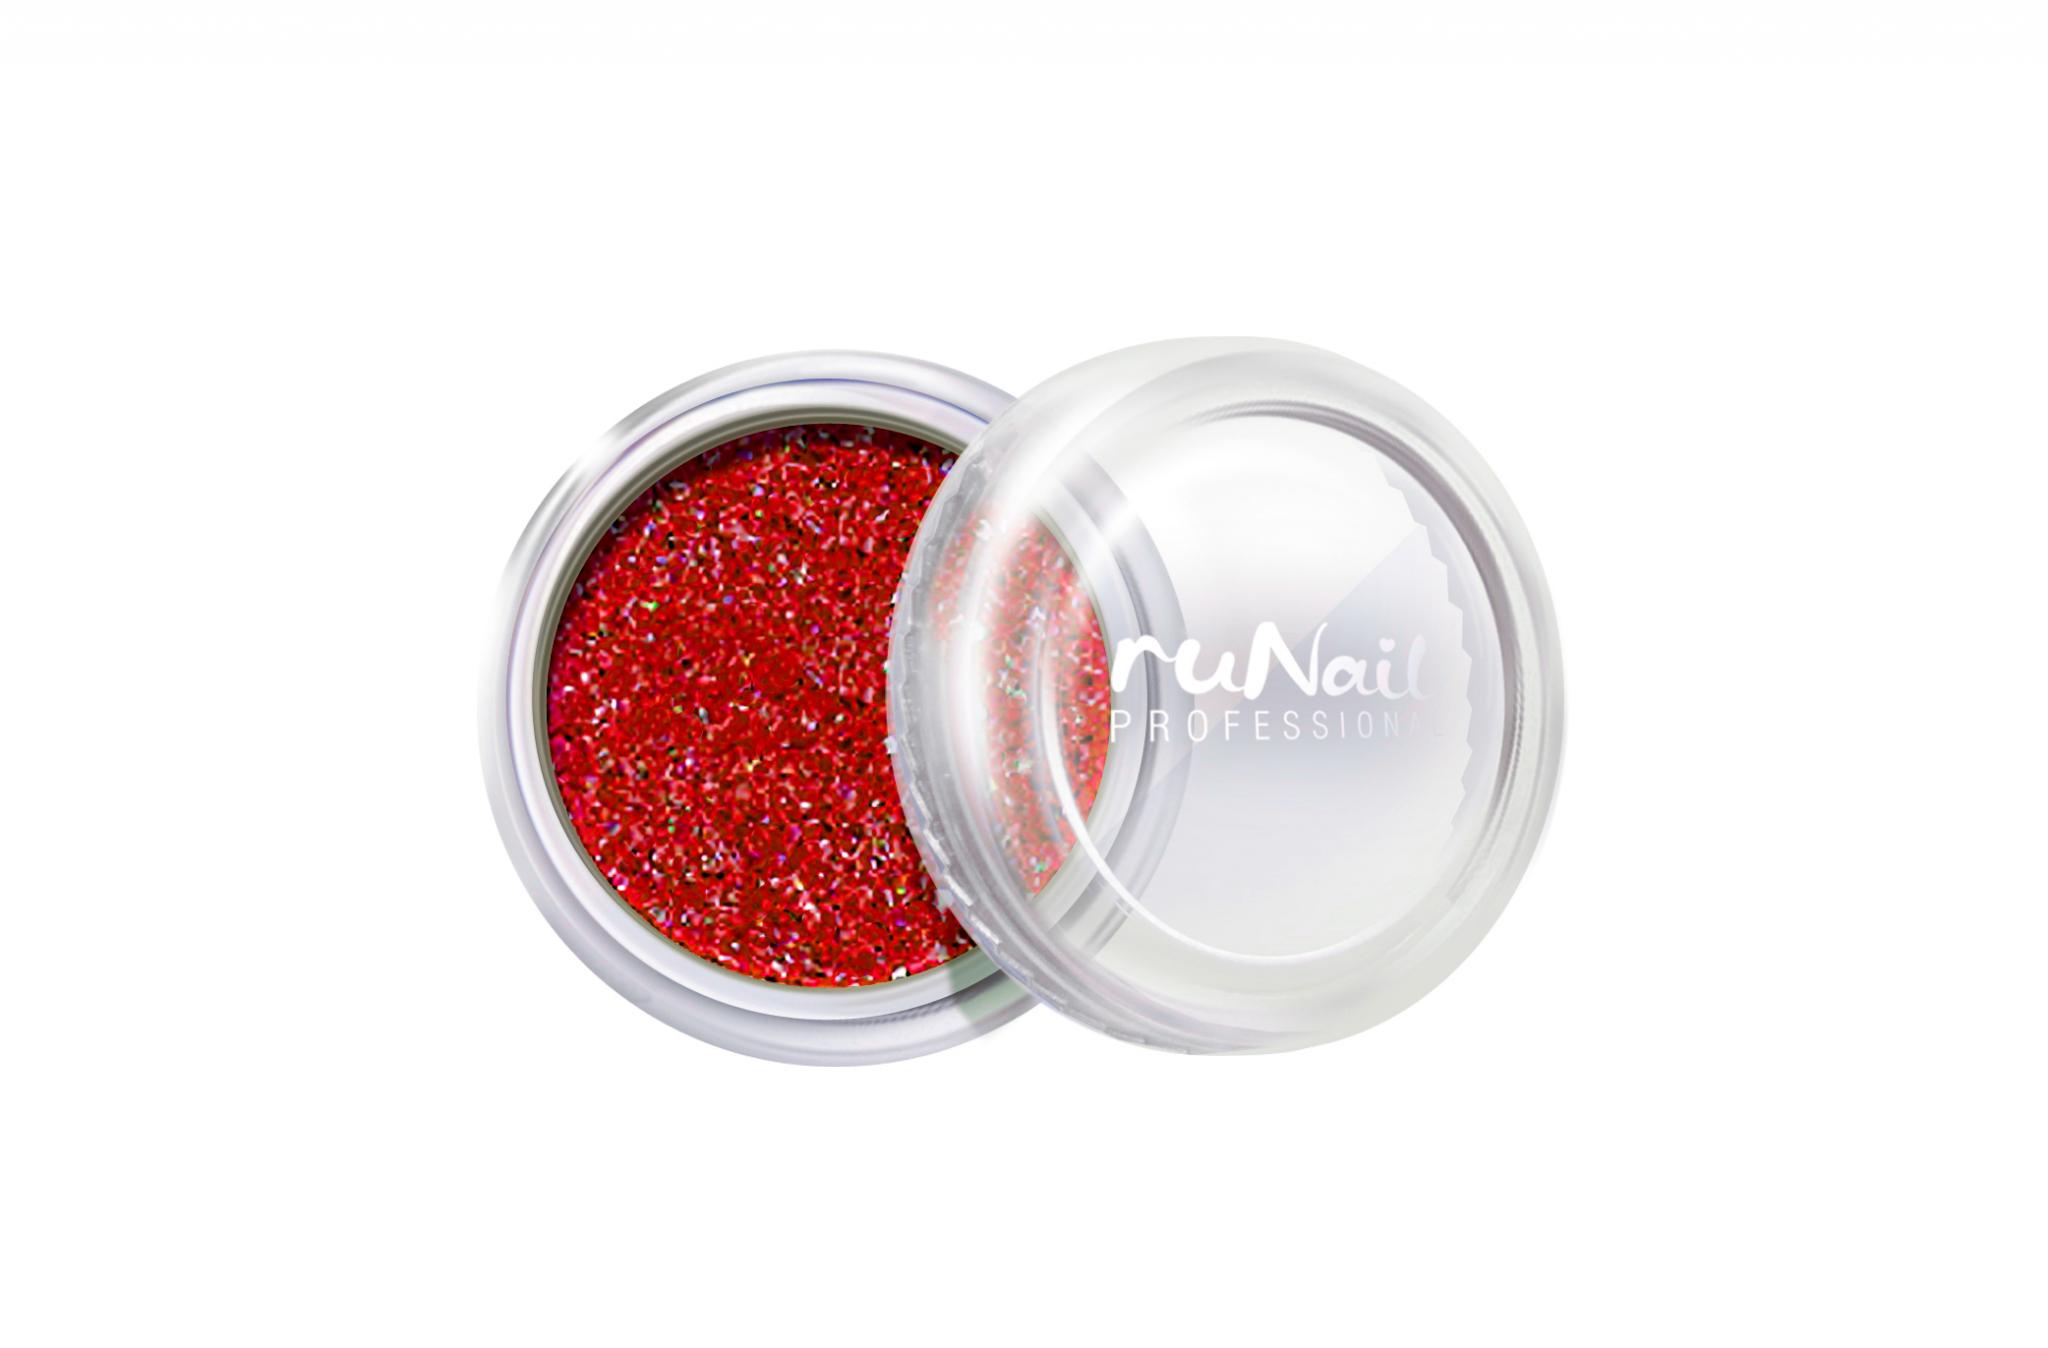 Дизайн для ногтей: зеркальная пыль №4285